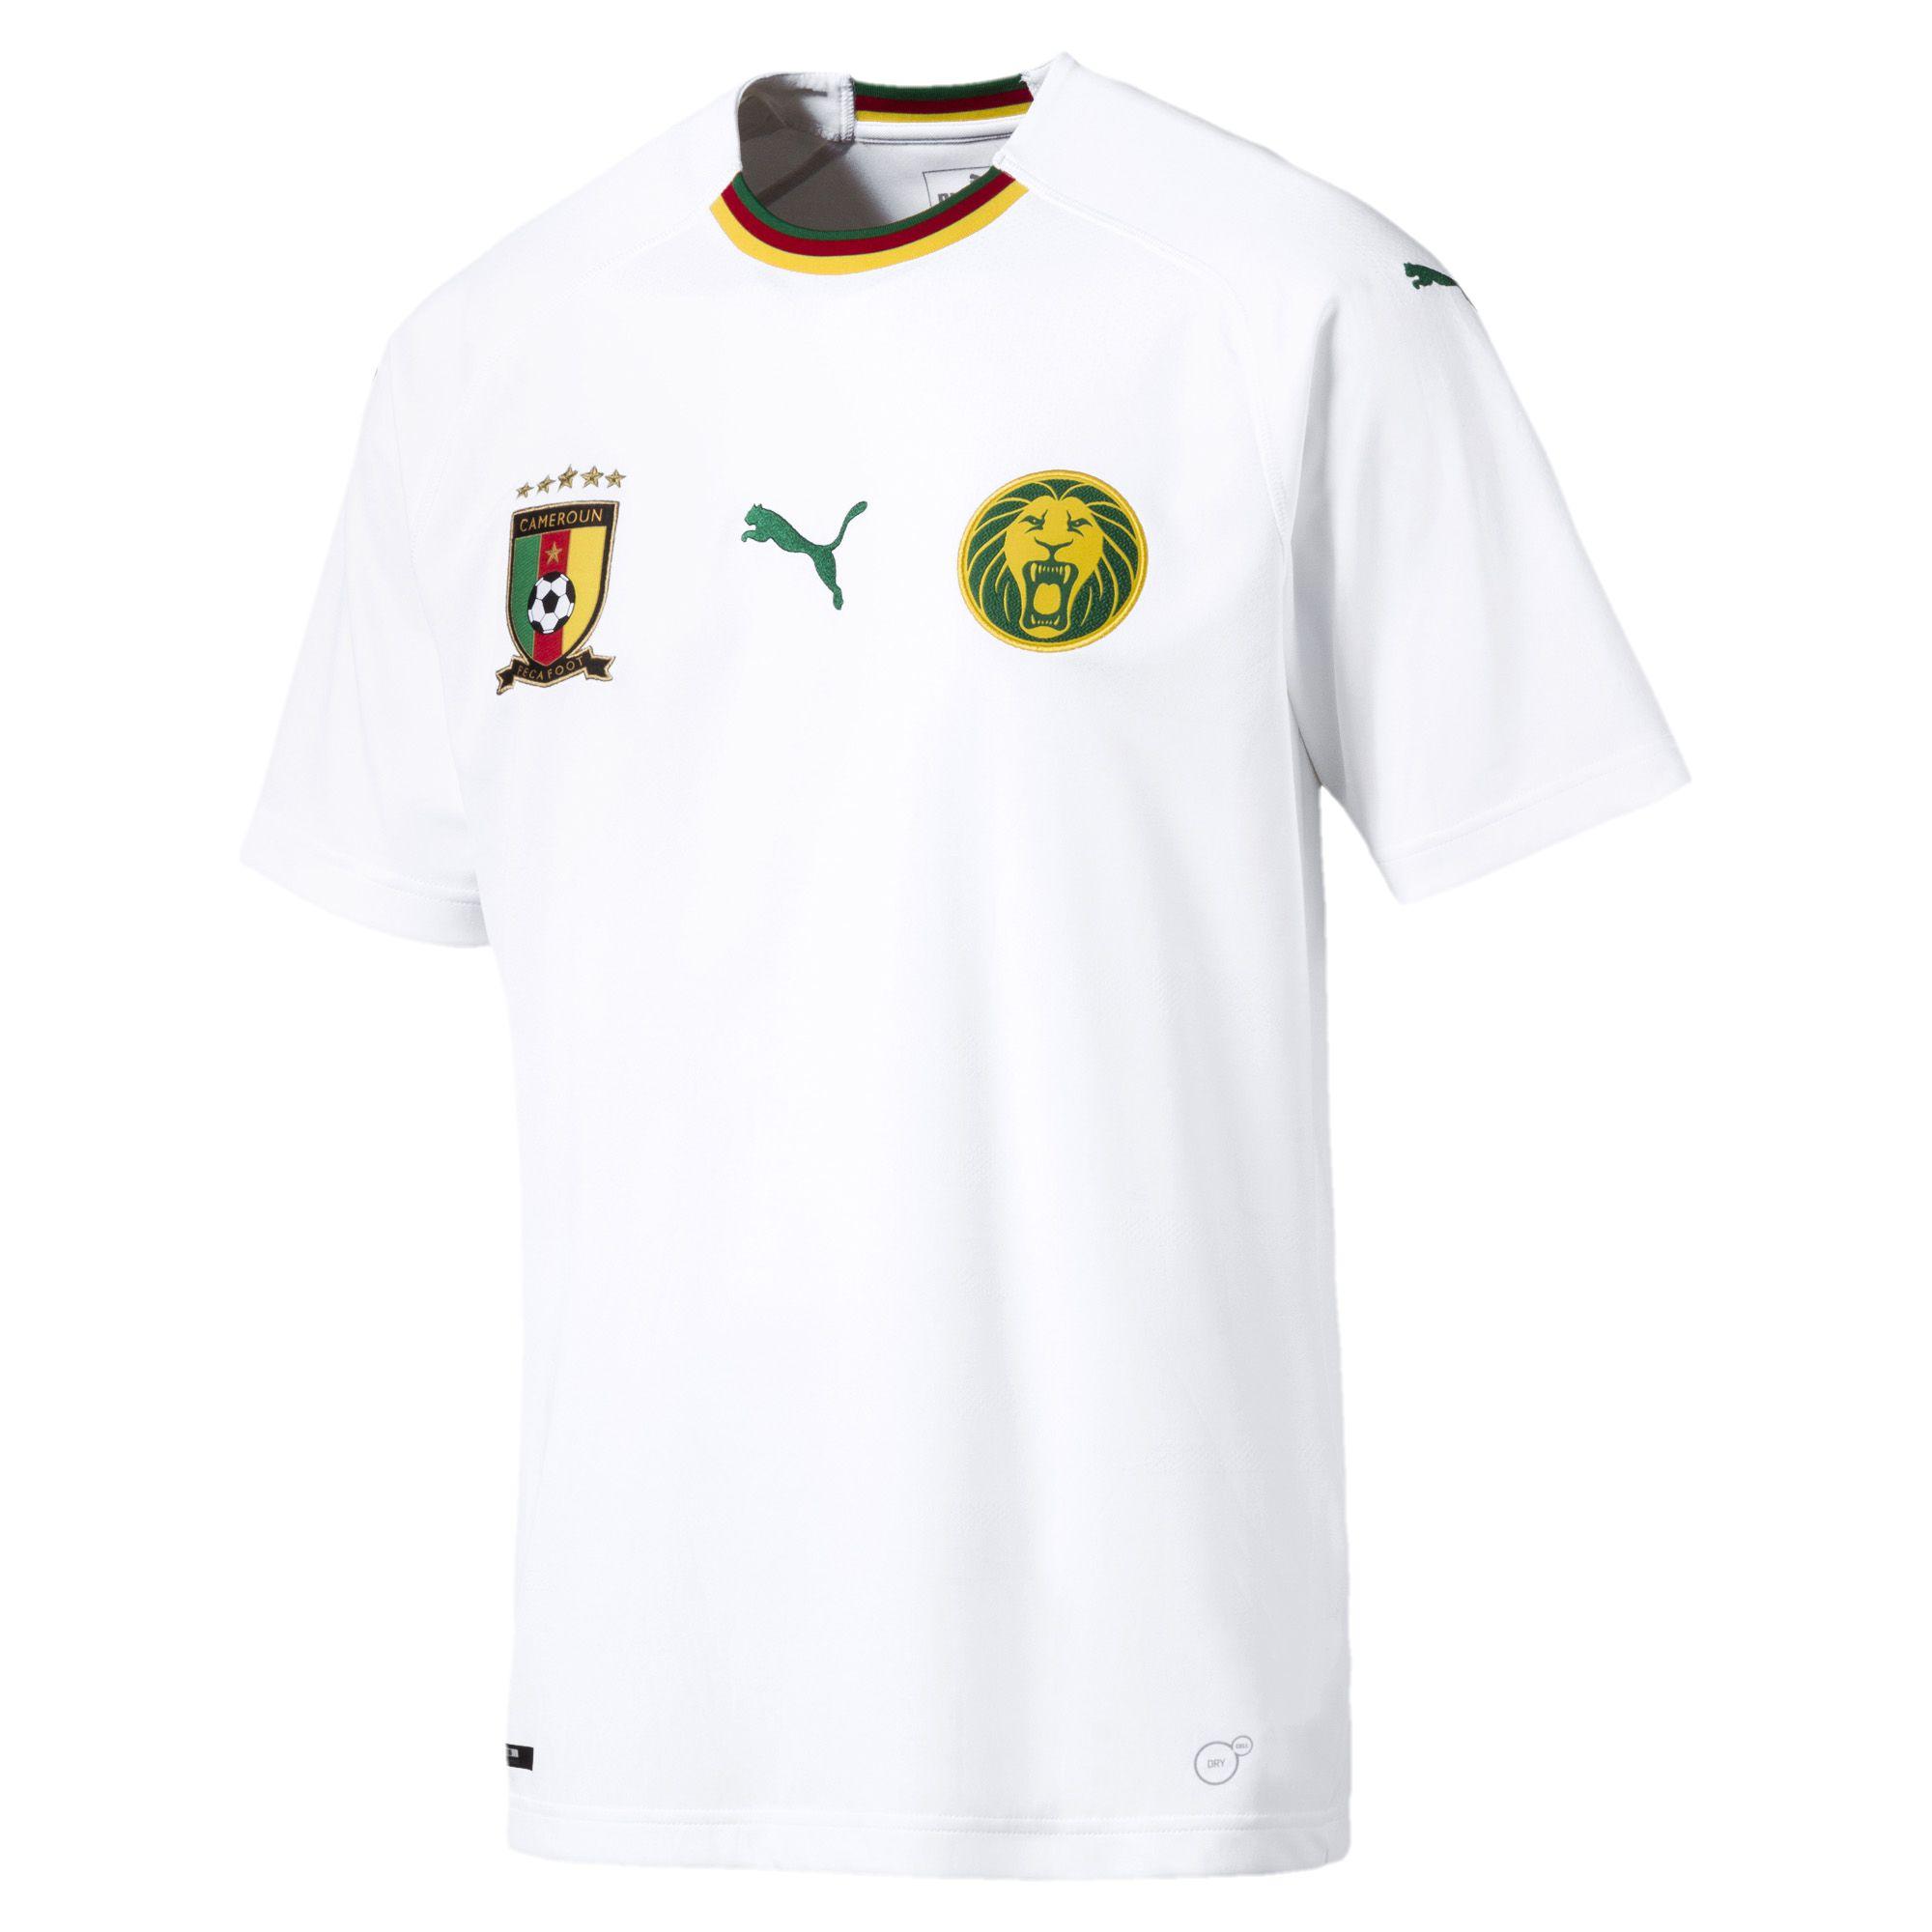 fc481a27b ... Cameroon 2018 Puma Home Kit · Click to enlarge image  cameroon 2018 puma away kit a.jpg ...